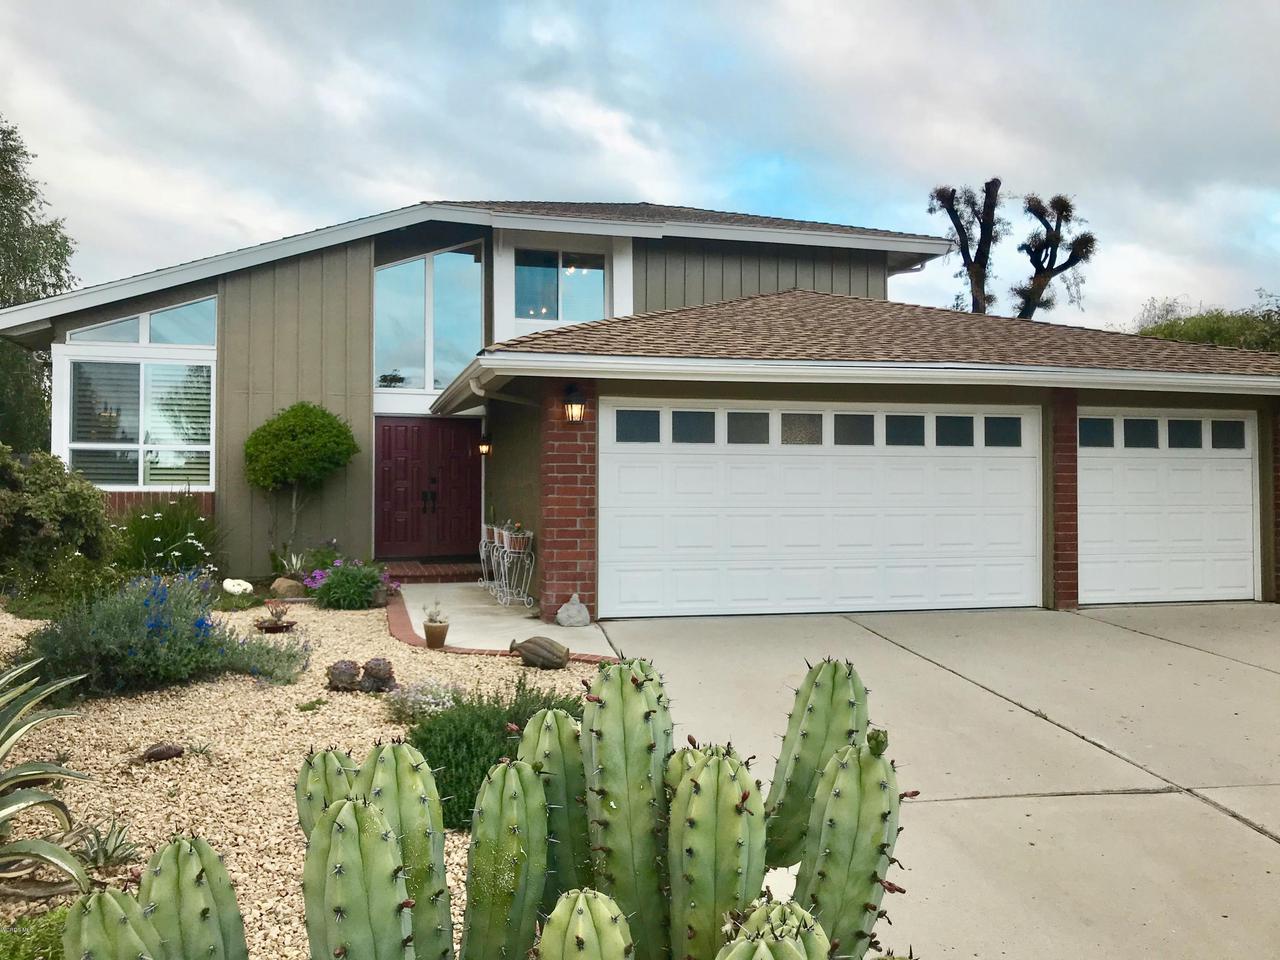 2933 HYACINTH, Thousand Oaks, CA 91360 - fullsizeoutput_3287